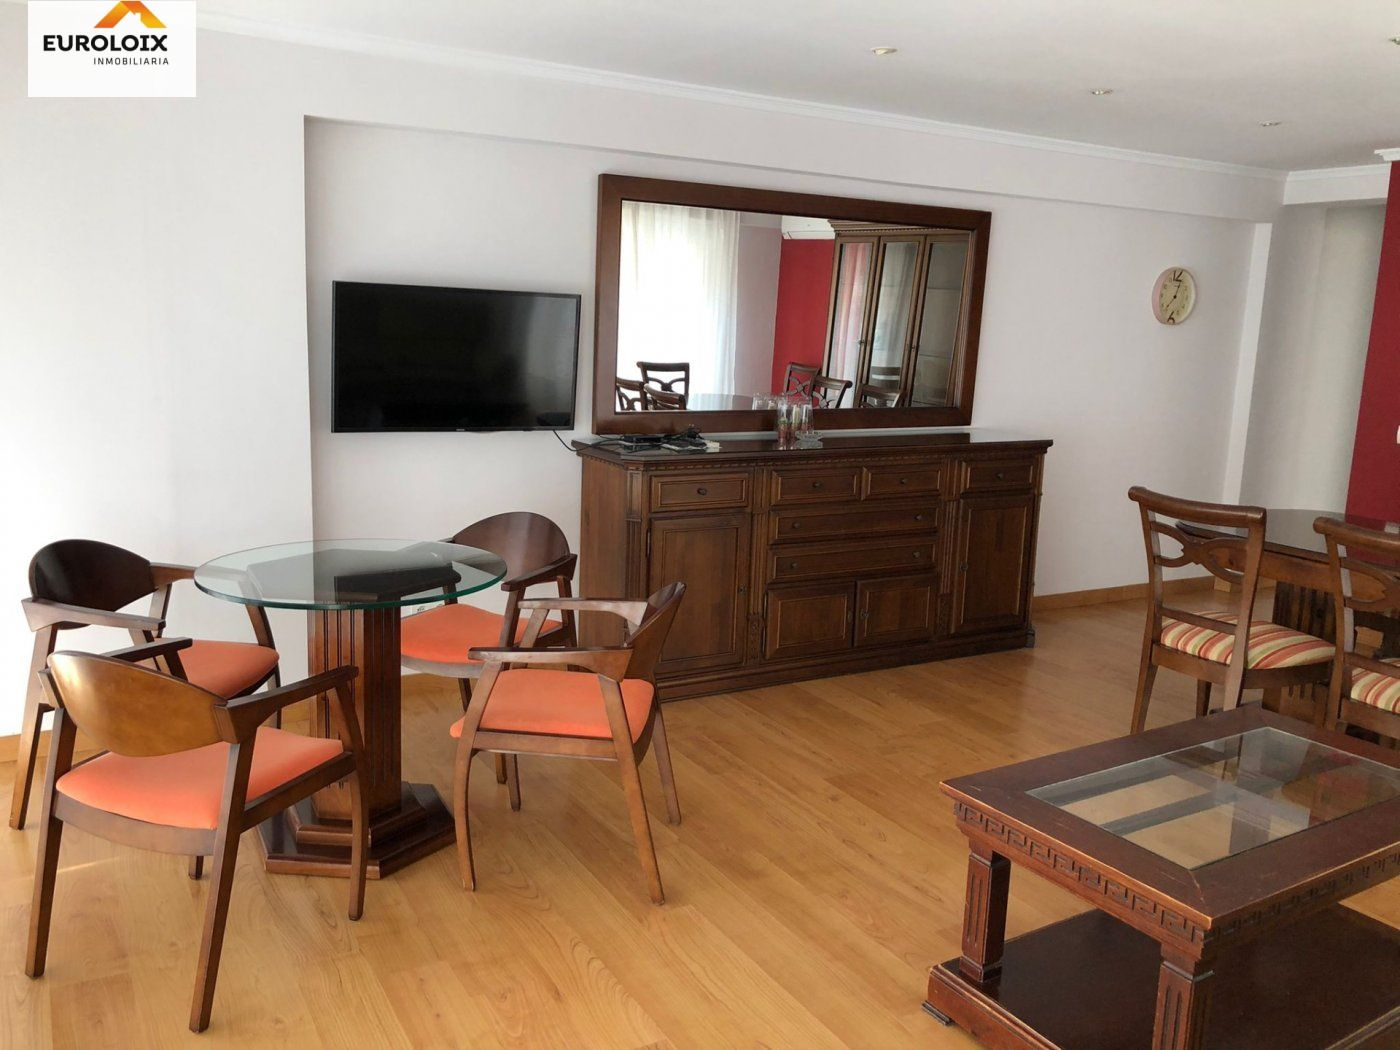 Flat for rent in Plaza Triangular, Benidorm